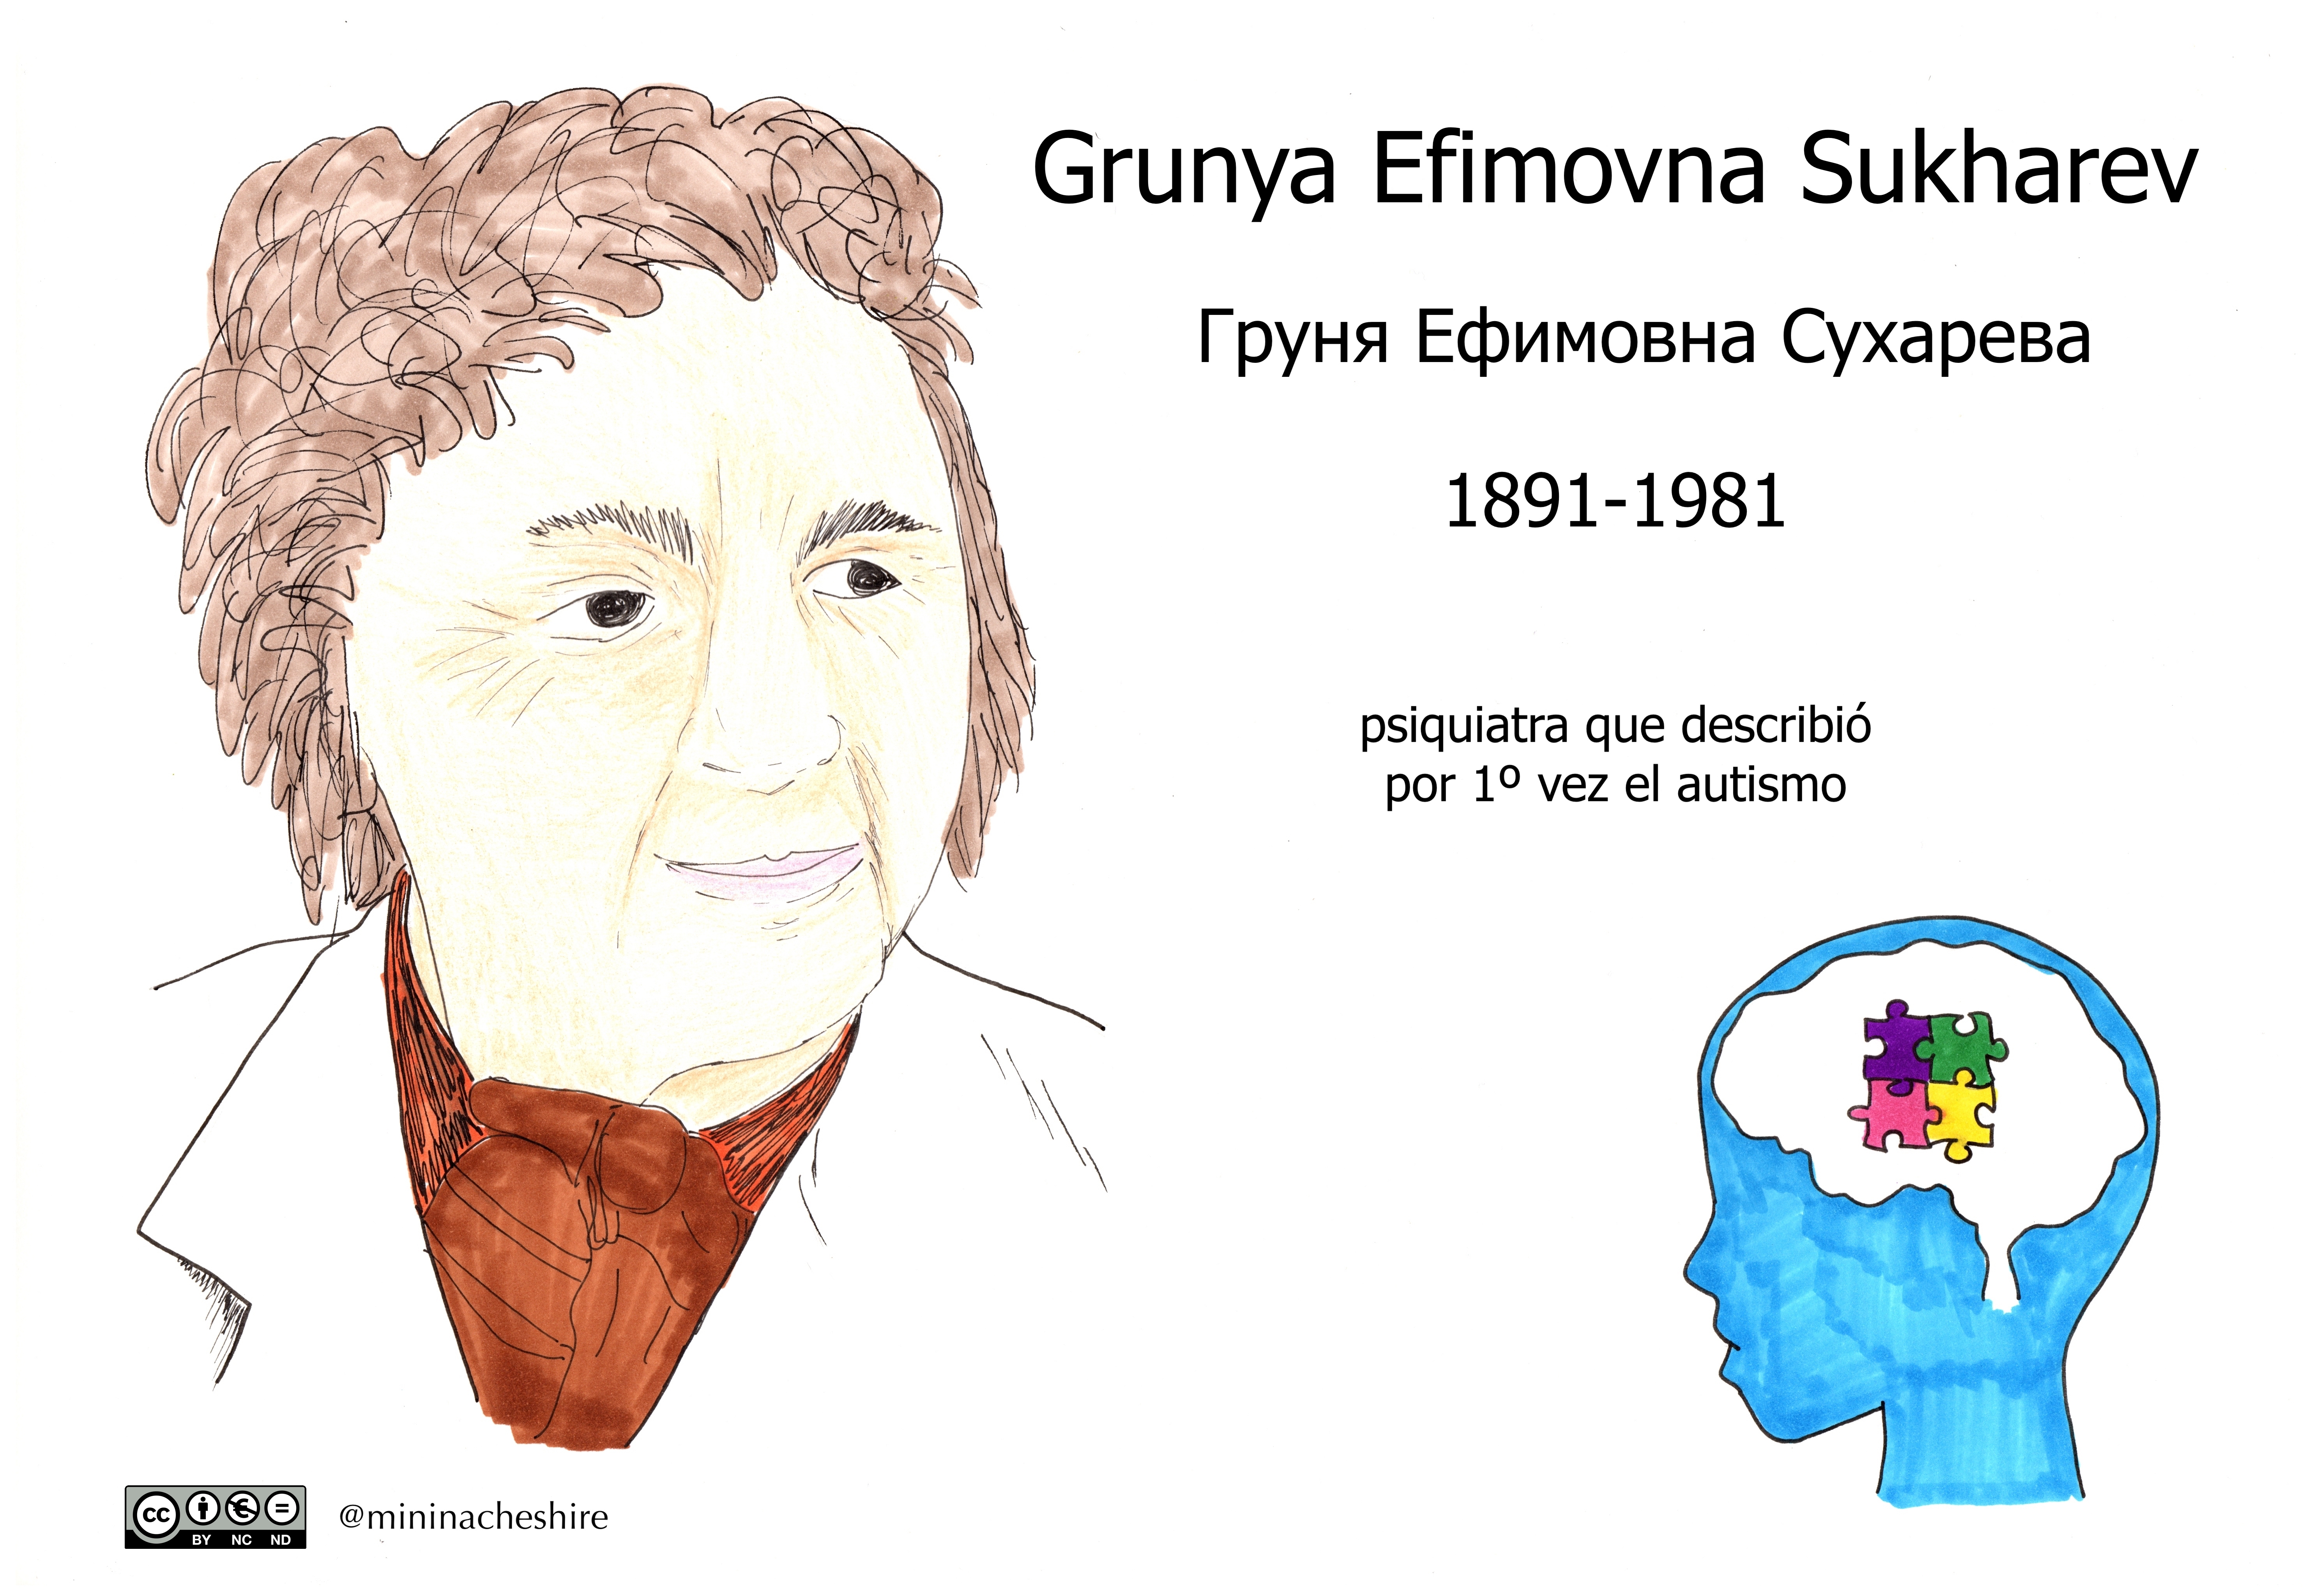 Poster de Grunya Efimovna Sukhareva